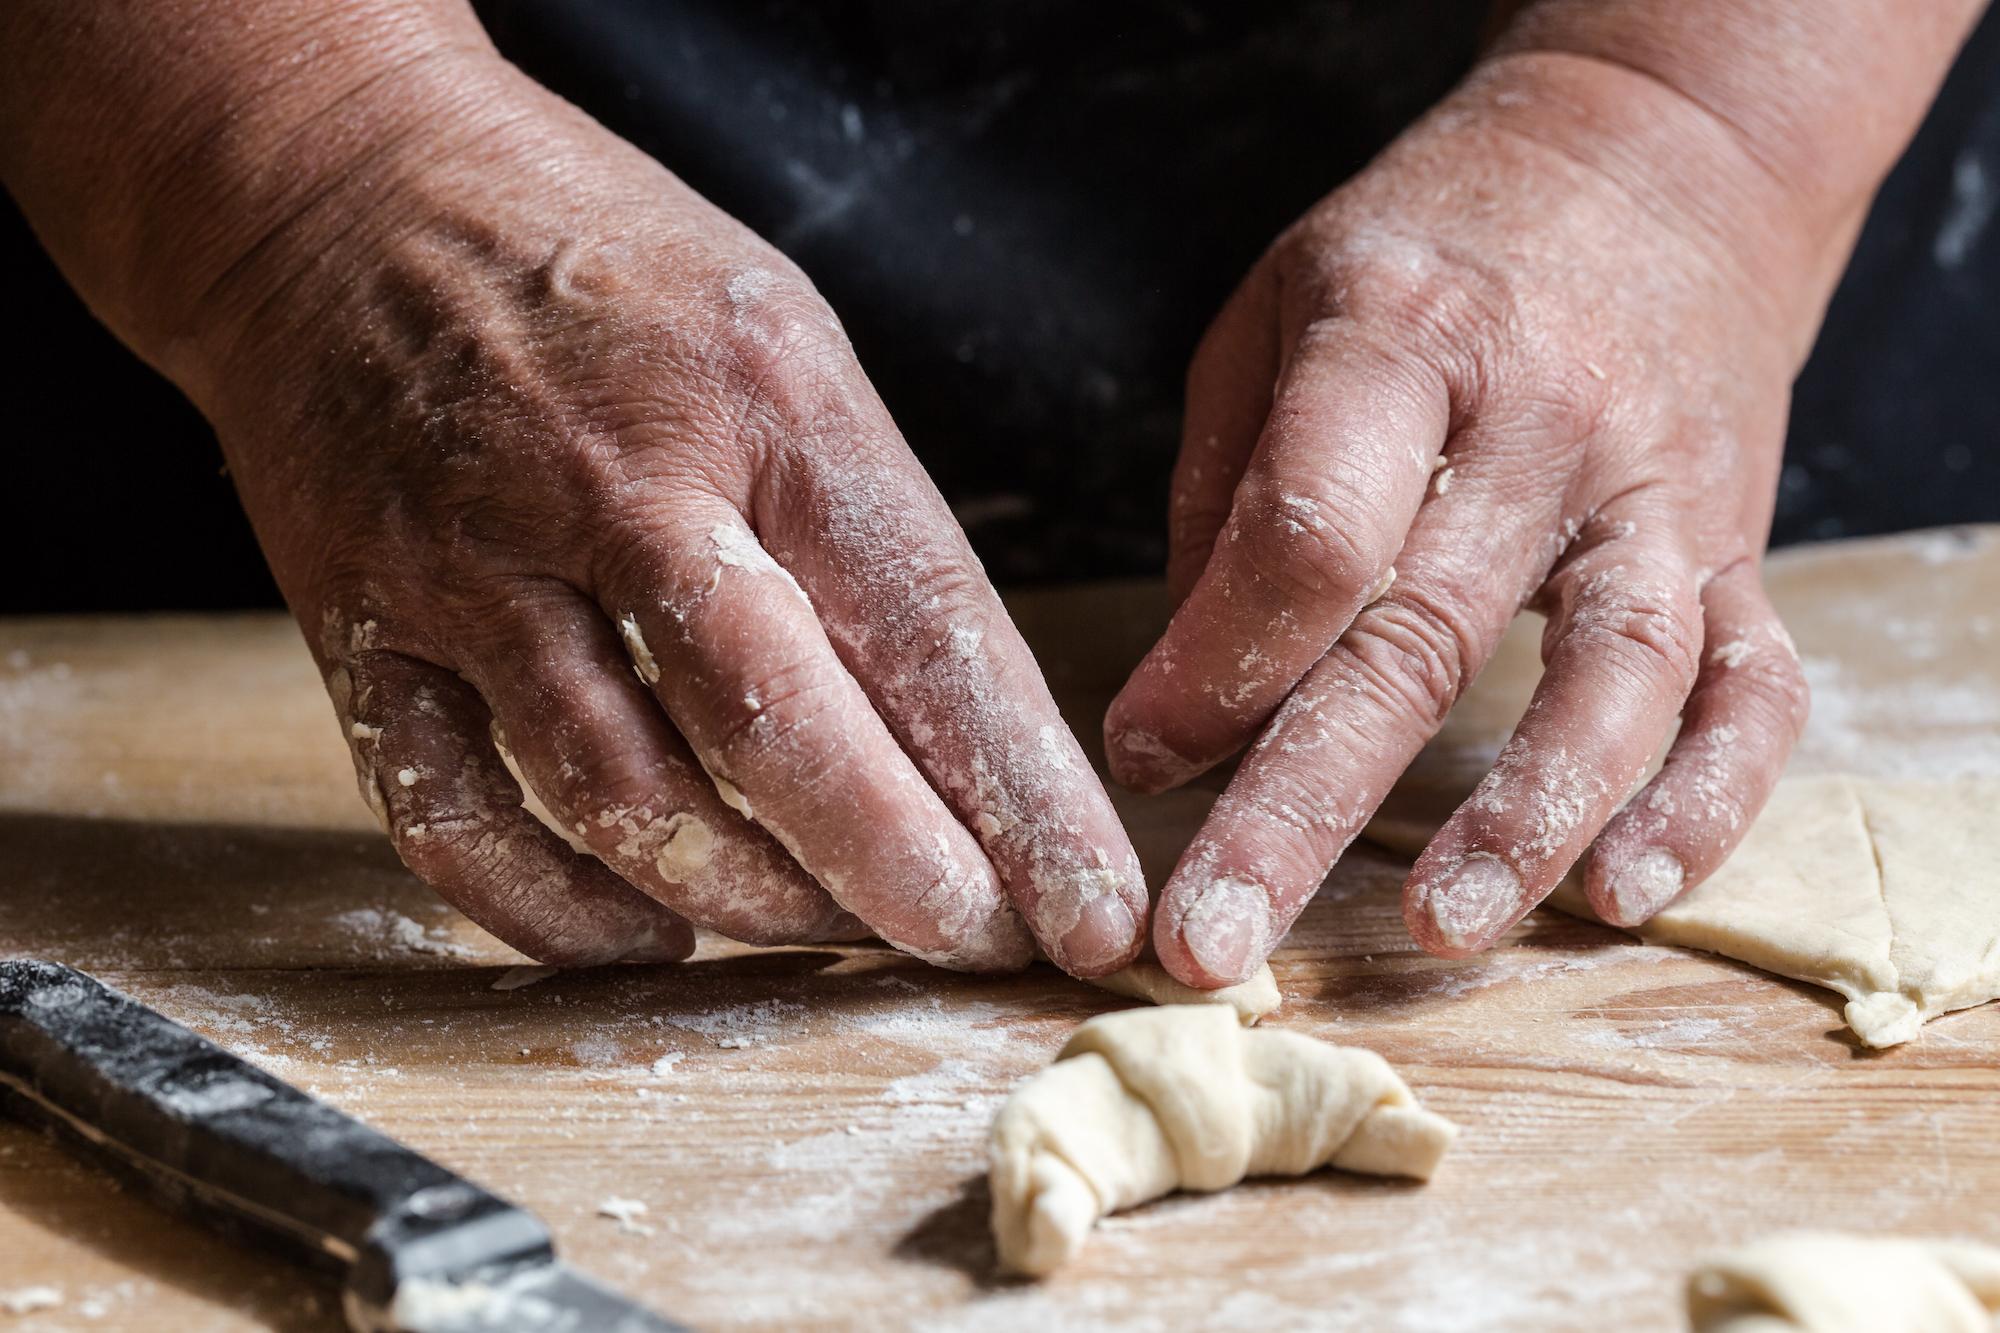 Hands rolling fresh homemade croissants